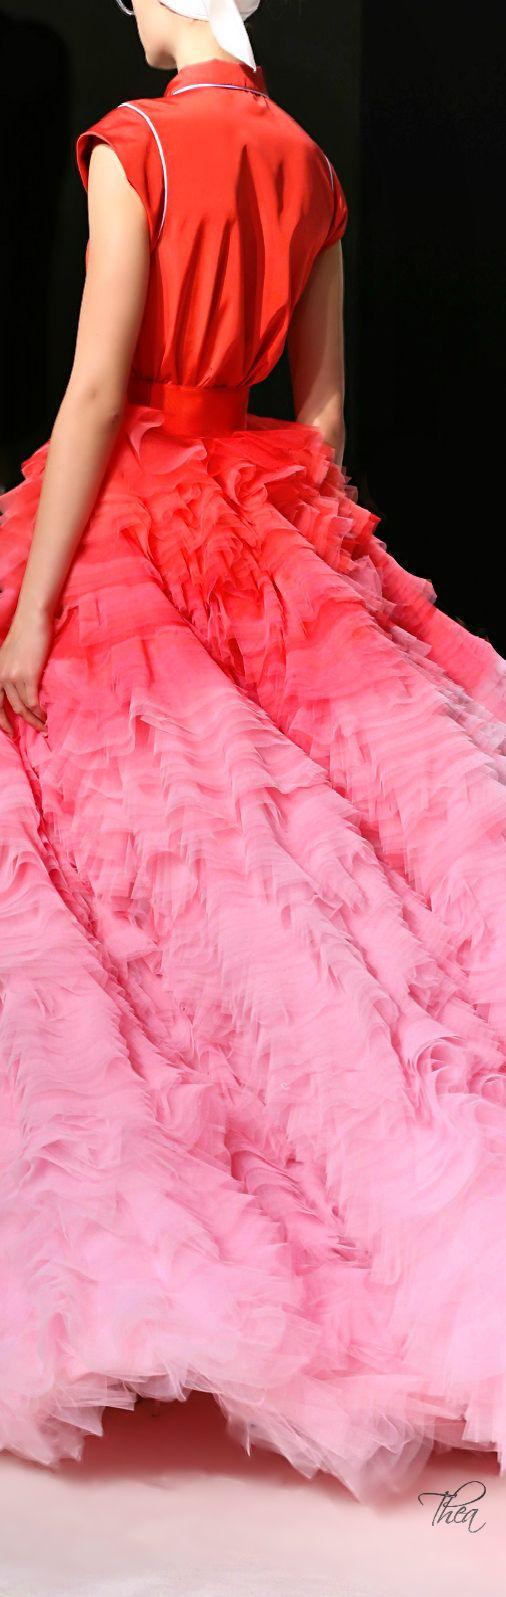 Giambattista Valli ~ Haute Couture Chiffon Gown, Ombre Red-Pink, 2014-15